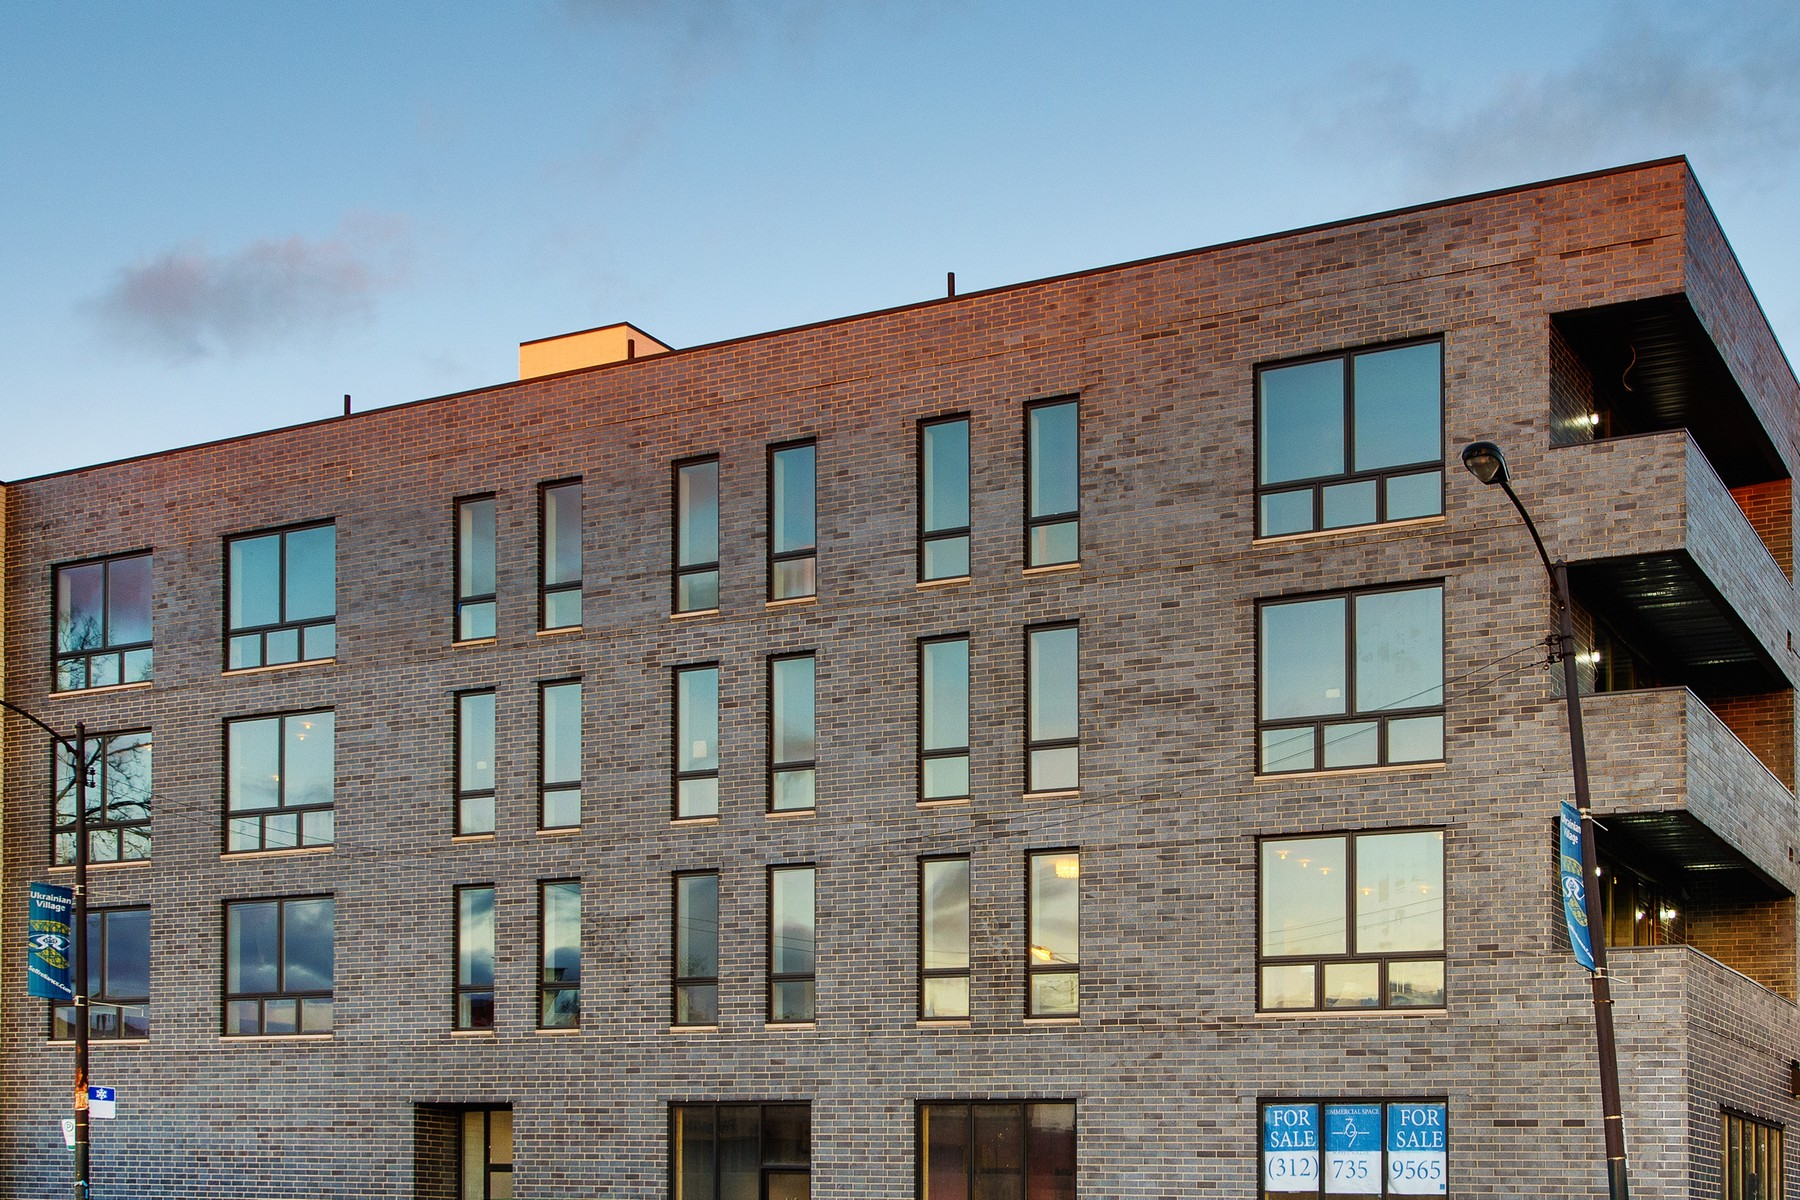 Condominium for Sale at Nine Unit Corner Elevator Building 707 N Western Avenue Unit 303 West Town, Chicago, Illinois, 60612 United States